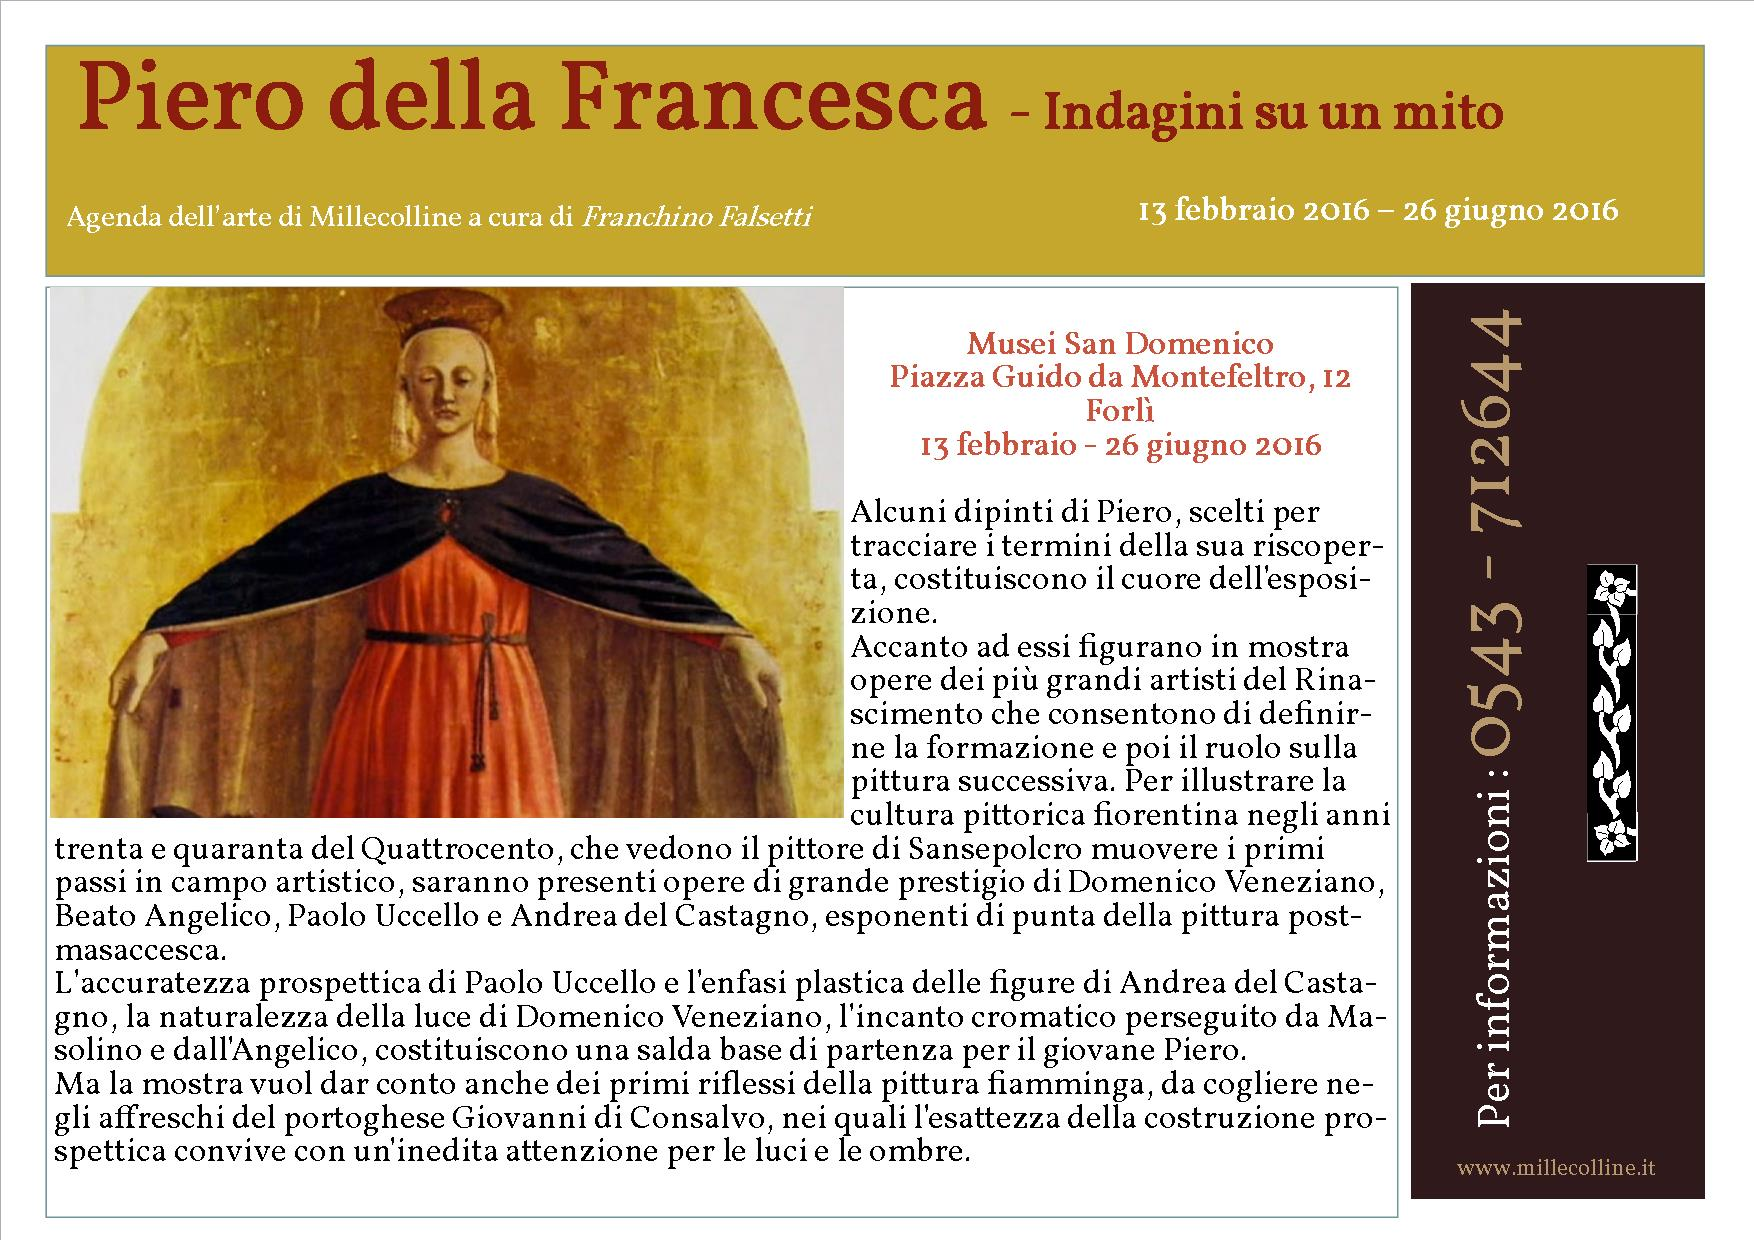 Agenda - Piero della Francesca